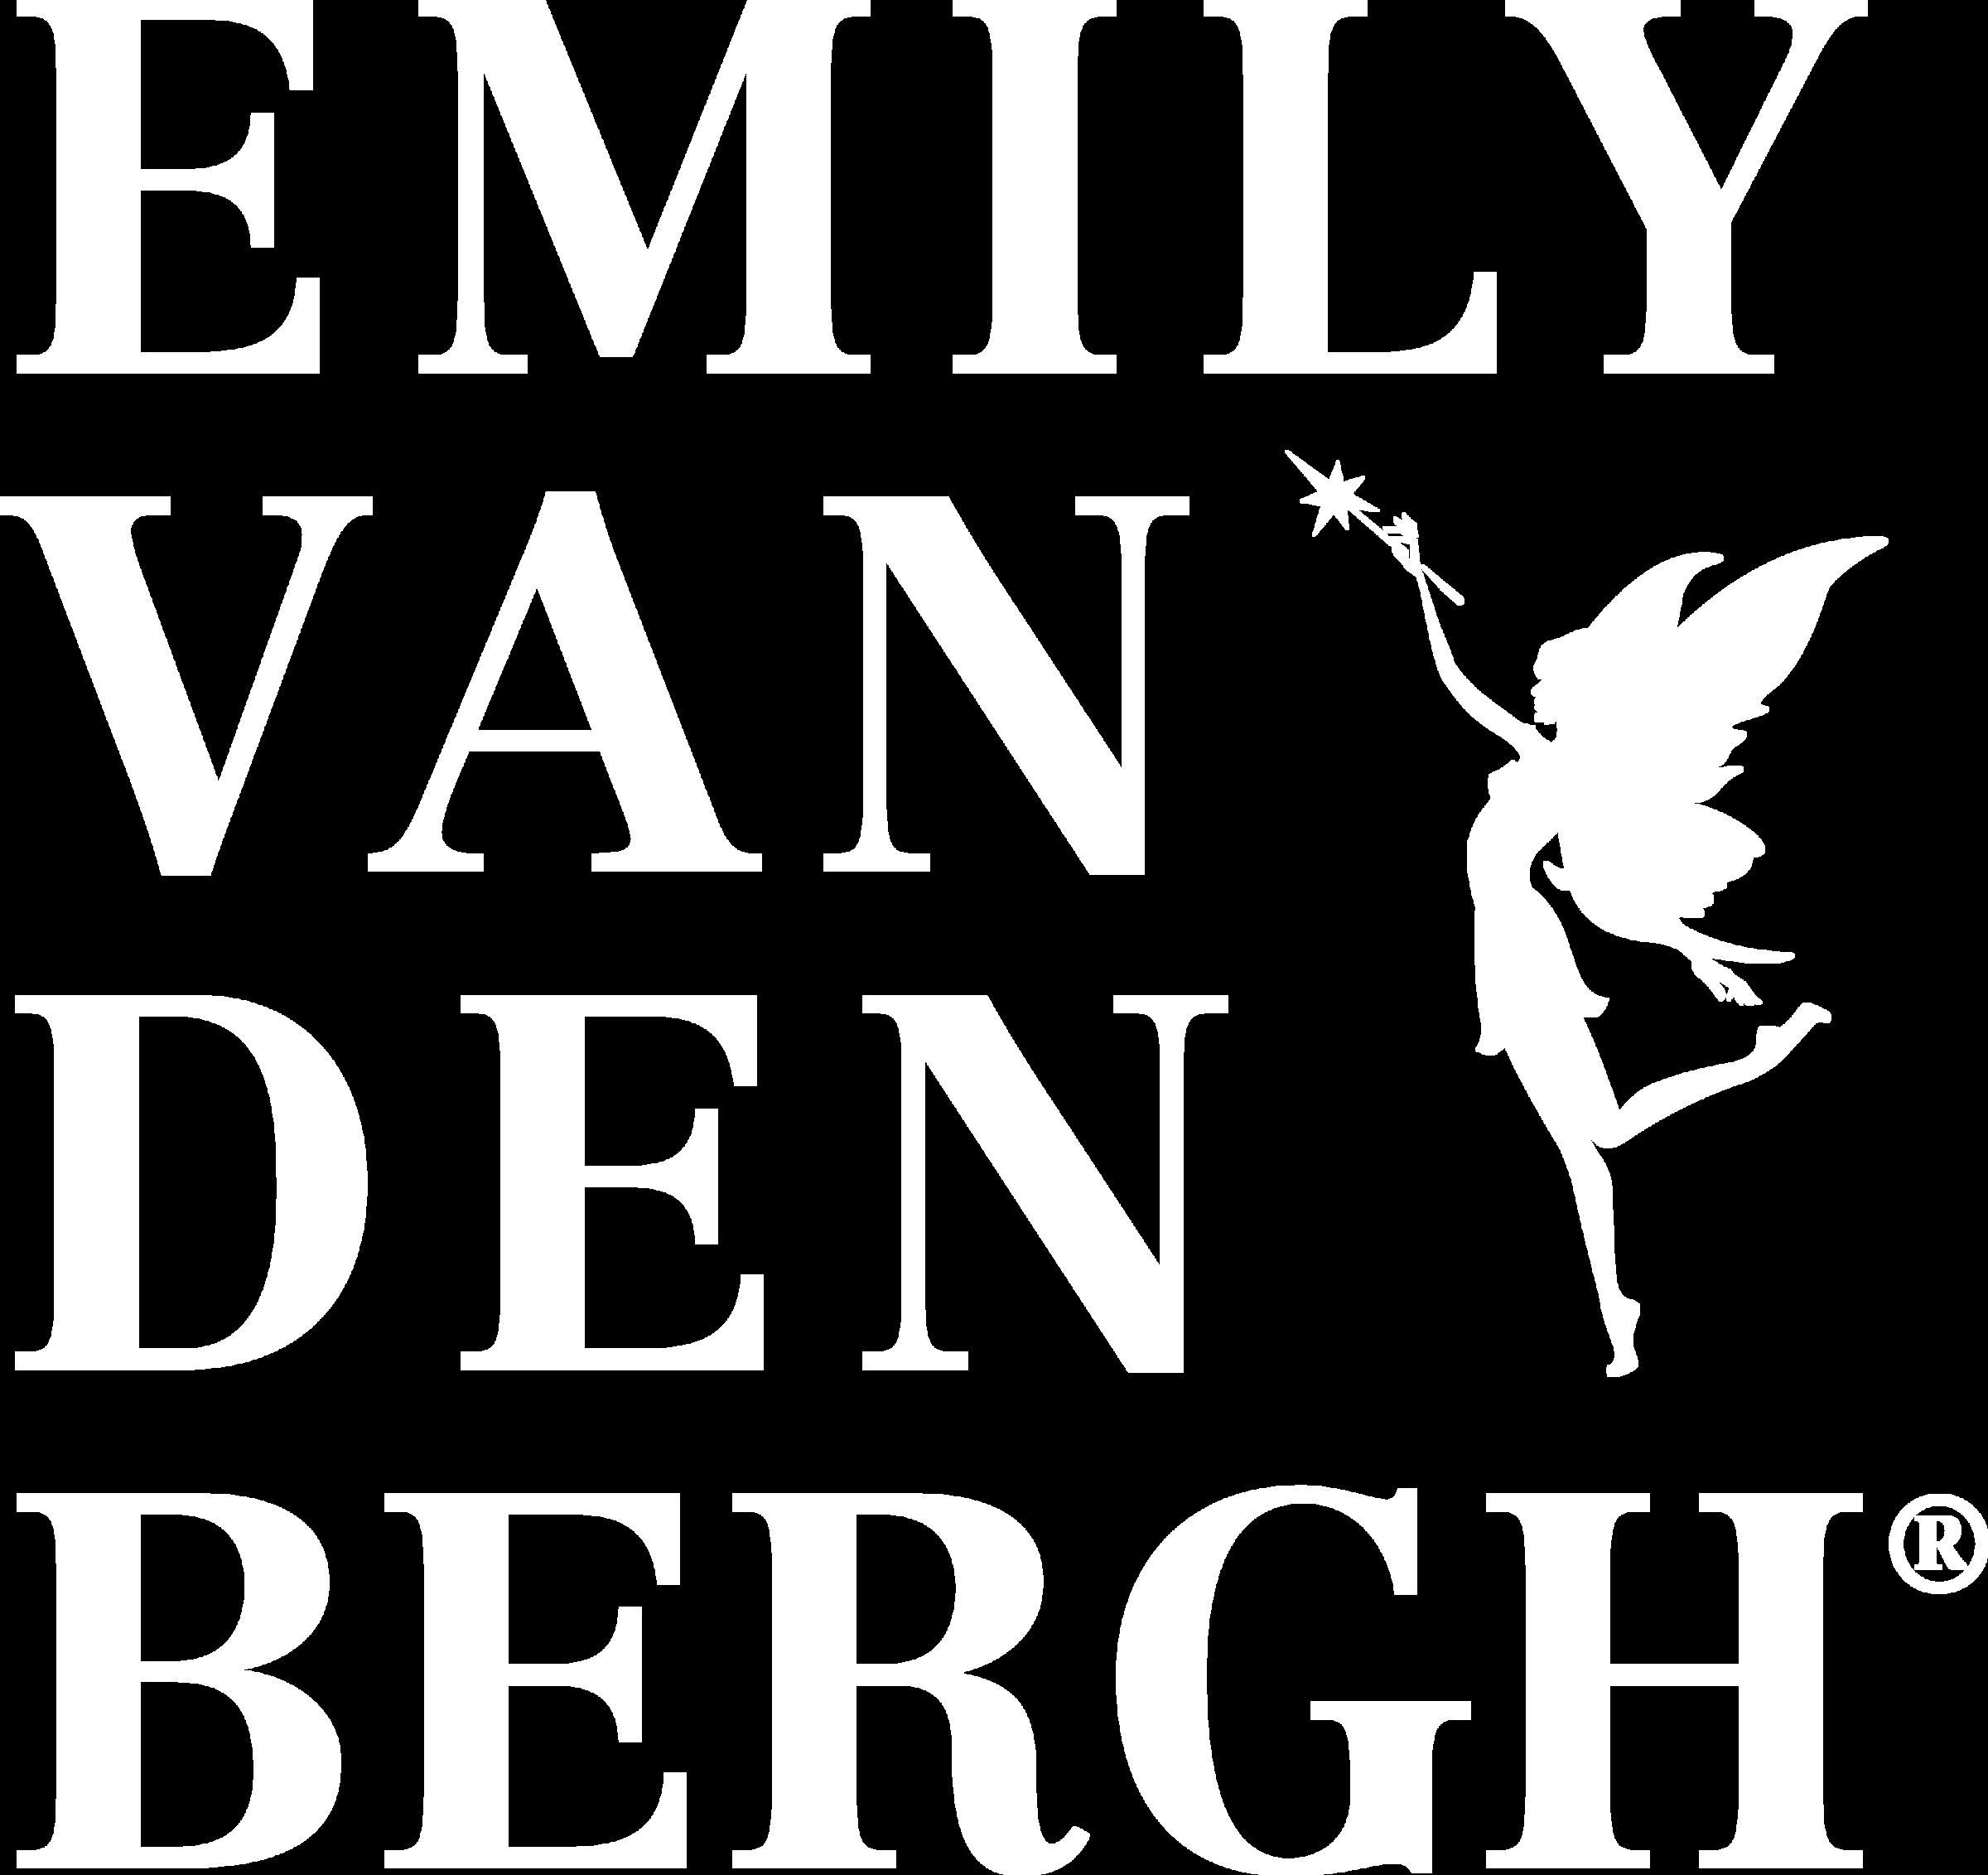 Emily van den Bergh Logo